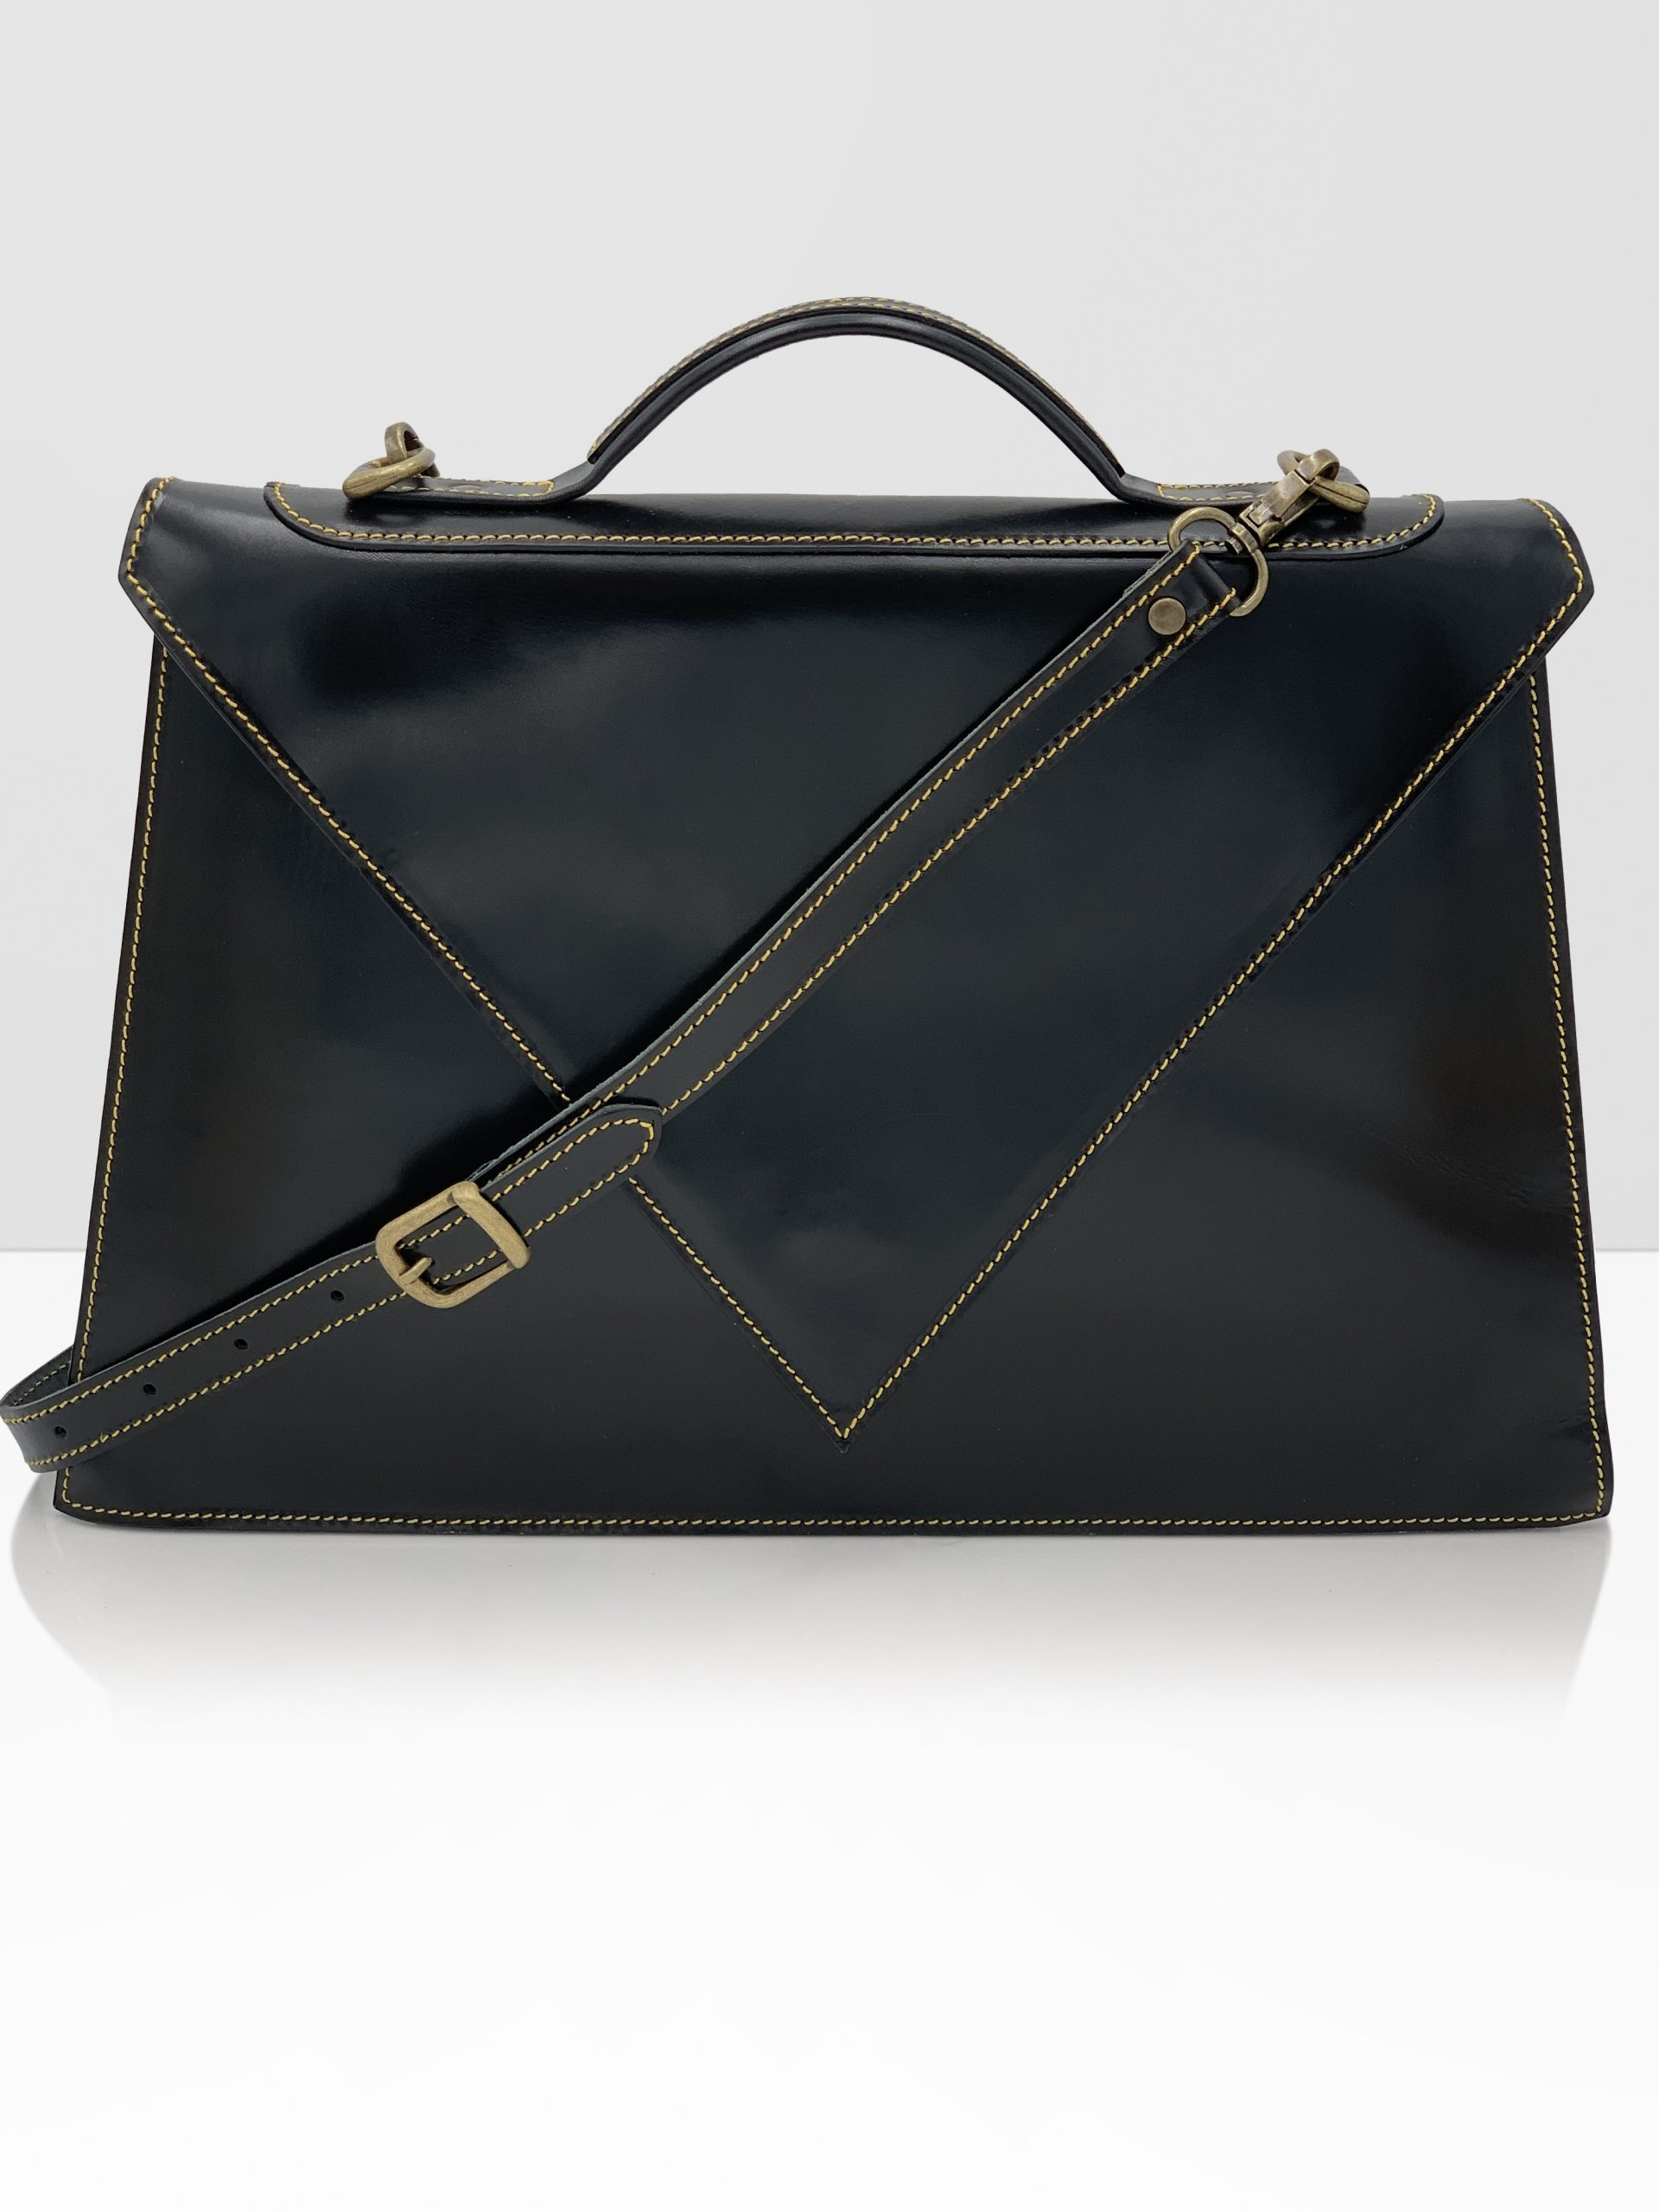 handmade leather wallets usa